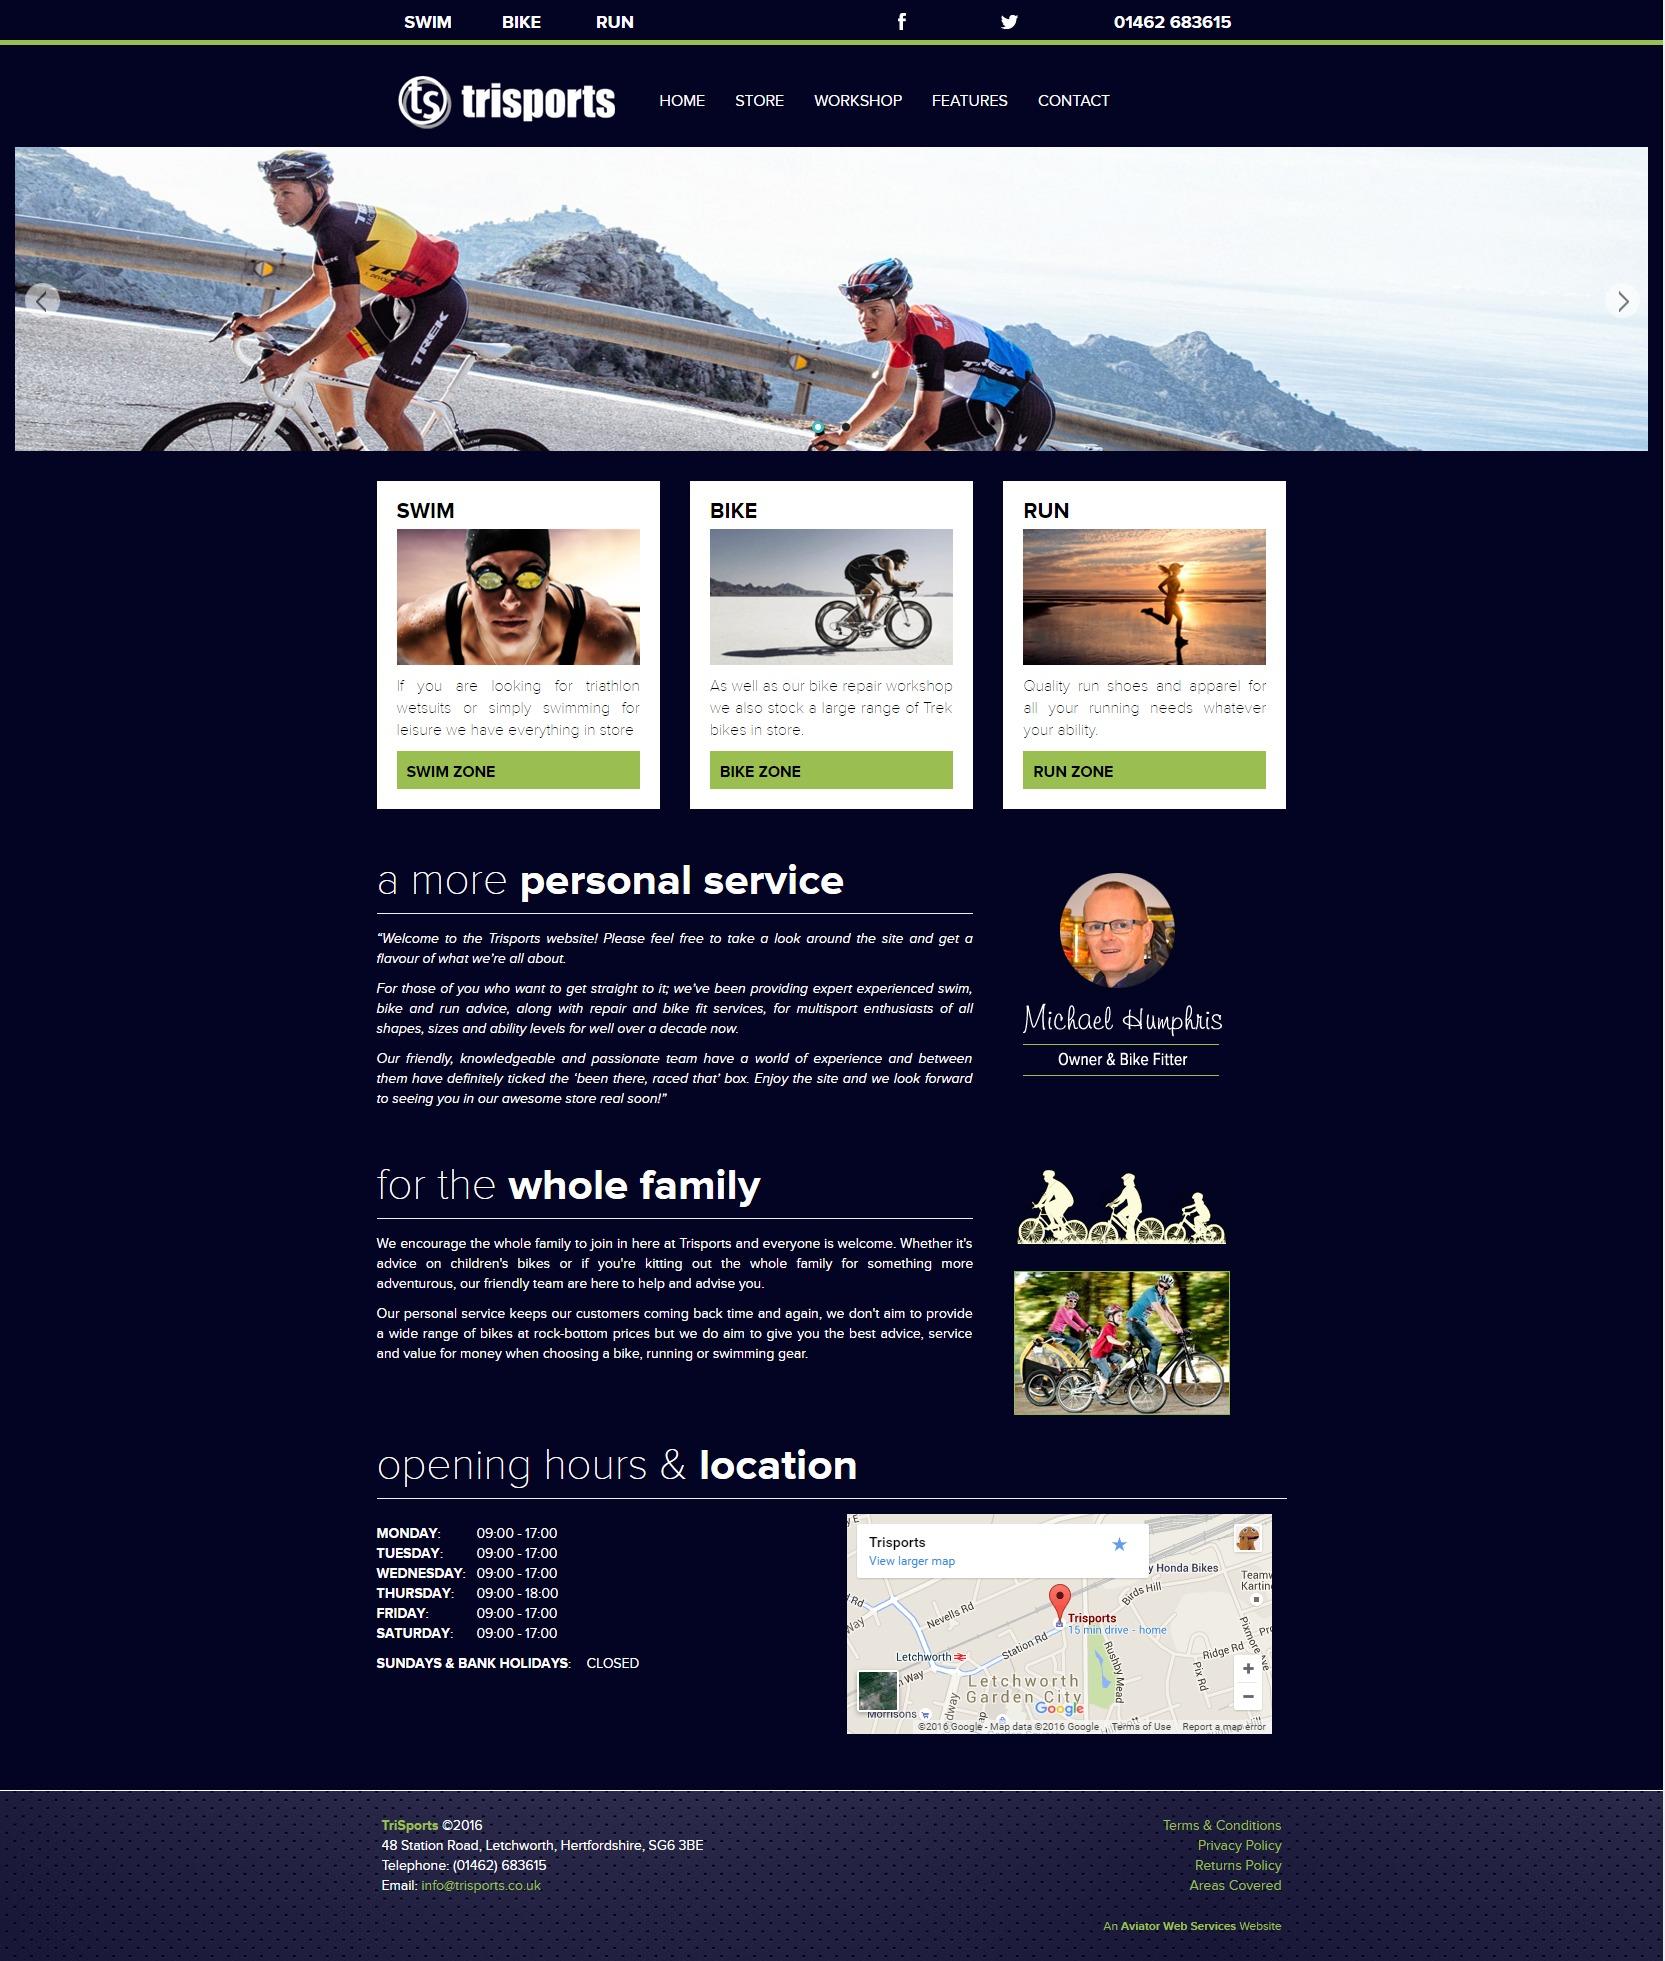 TriSports Letchworth - website first design rendering